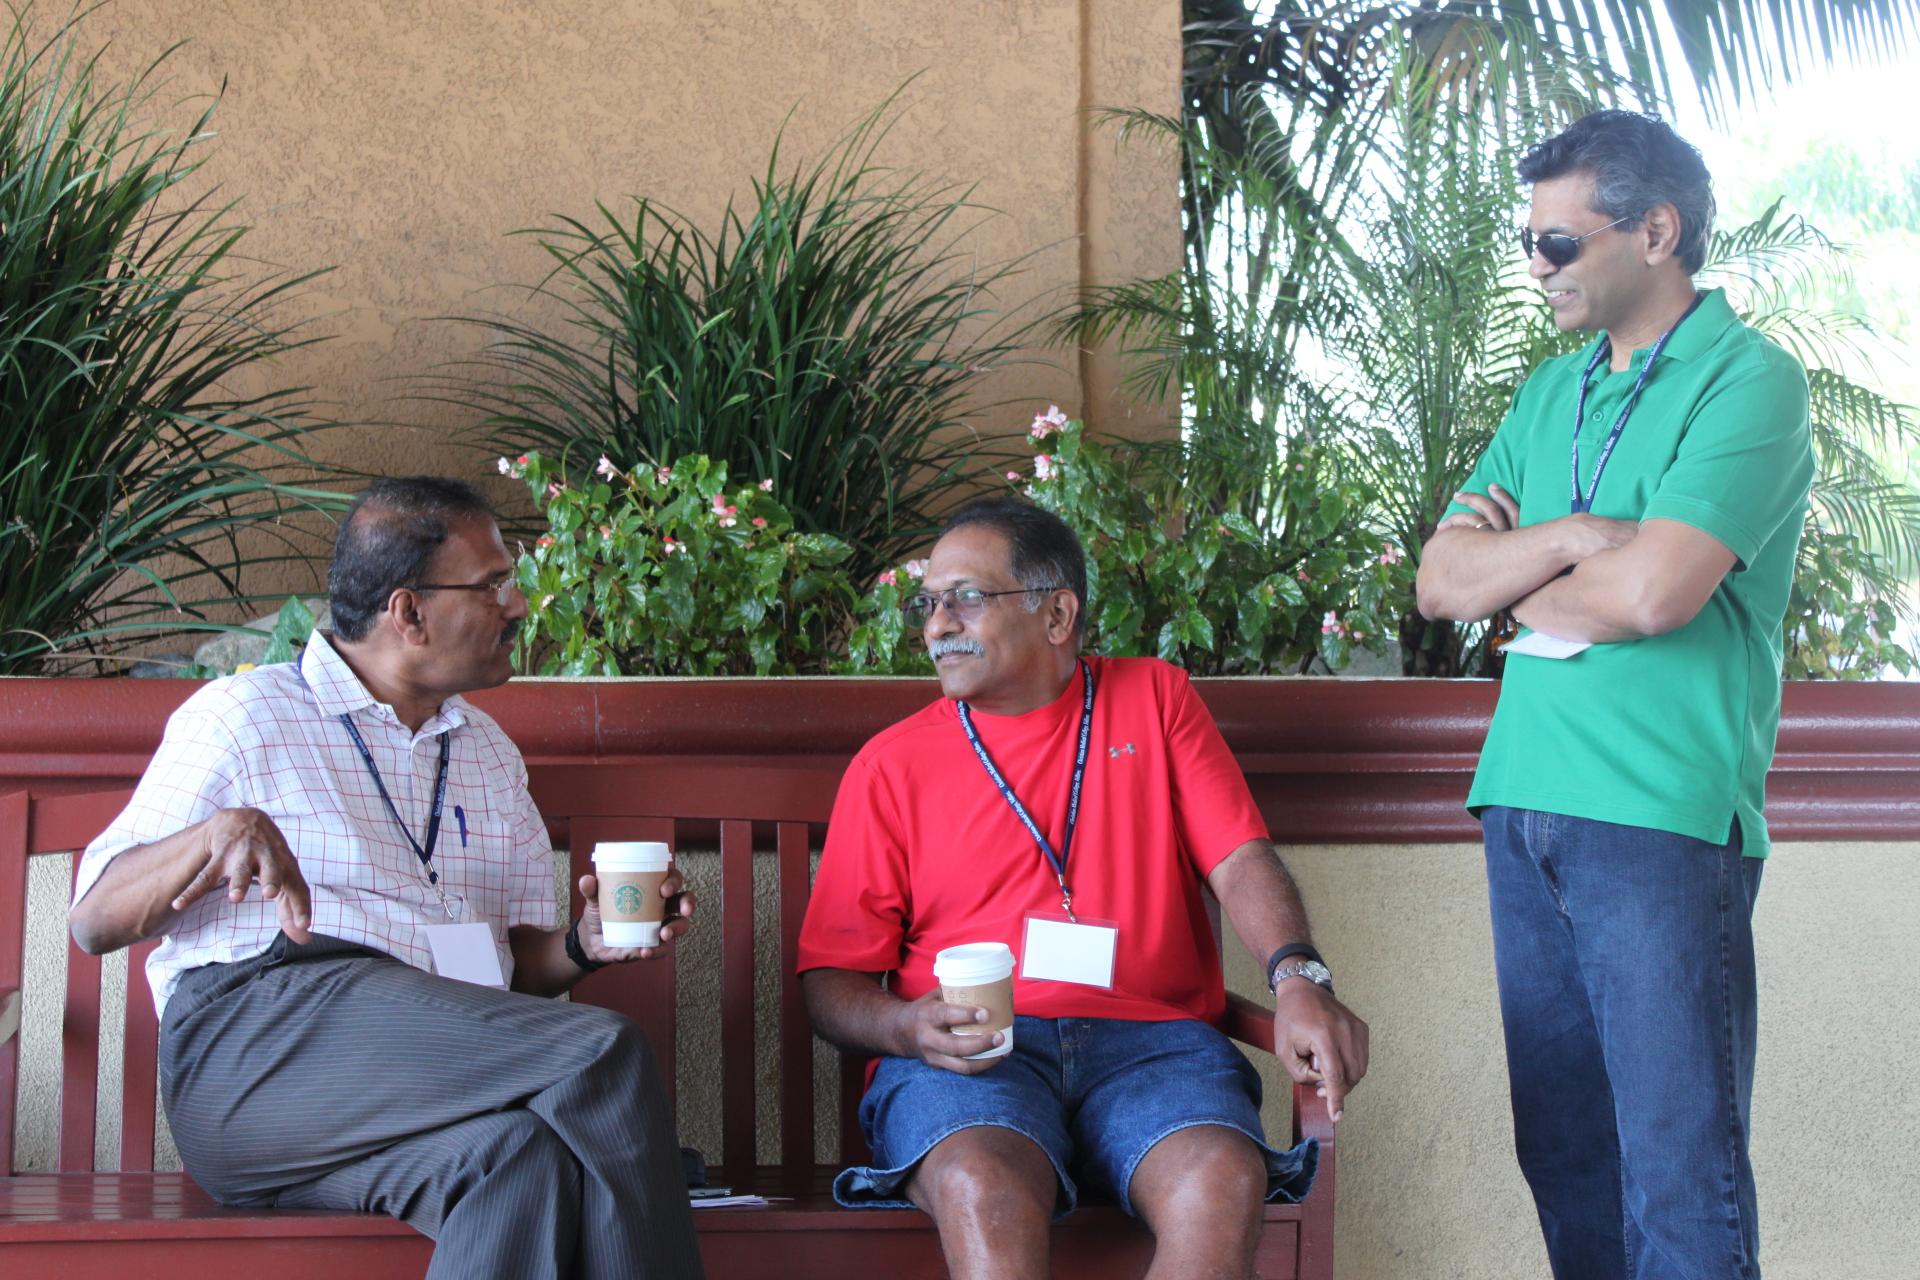 Coffee with Samson, Ravi and Mithran